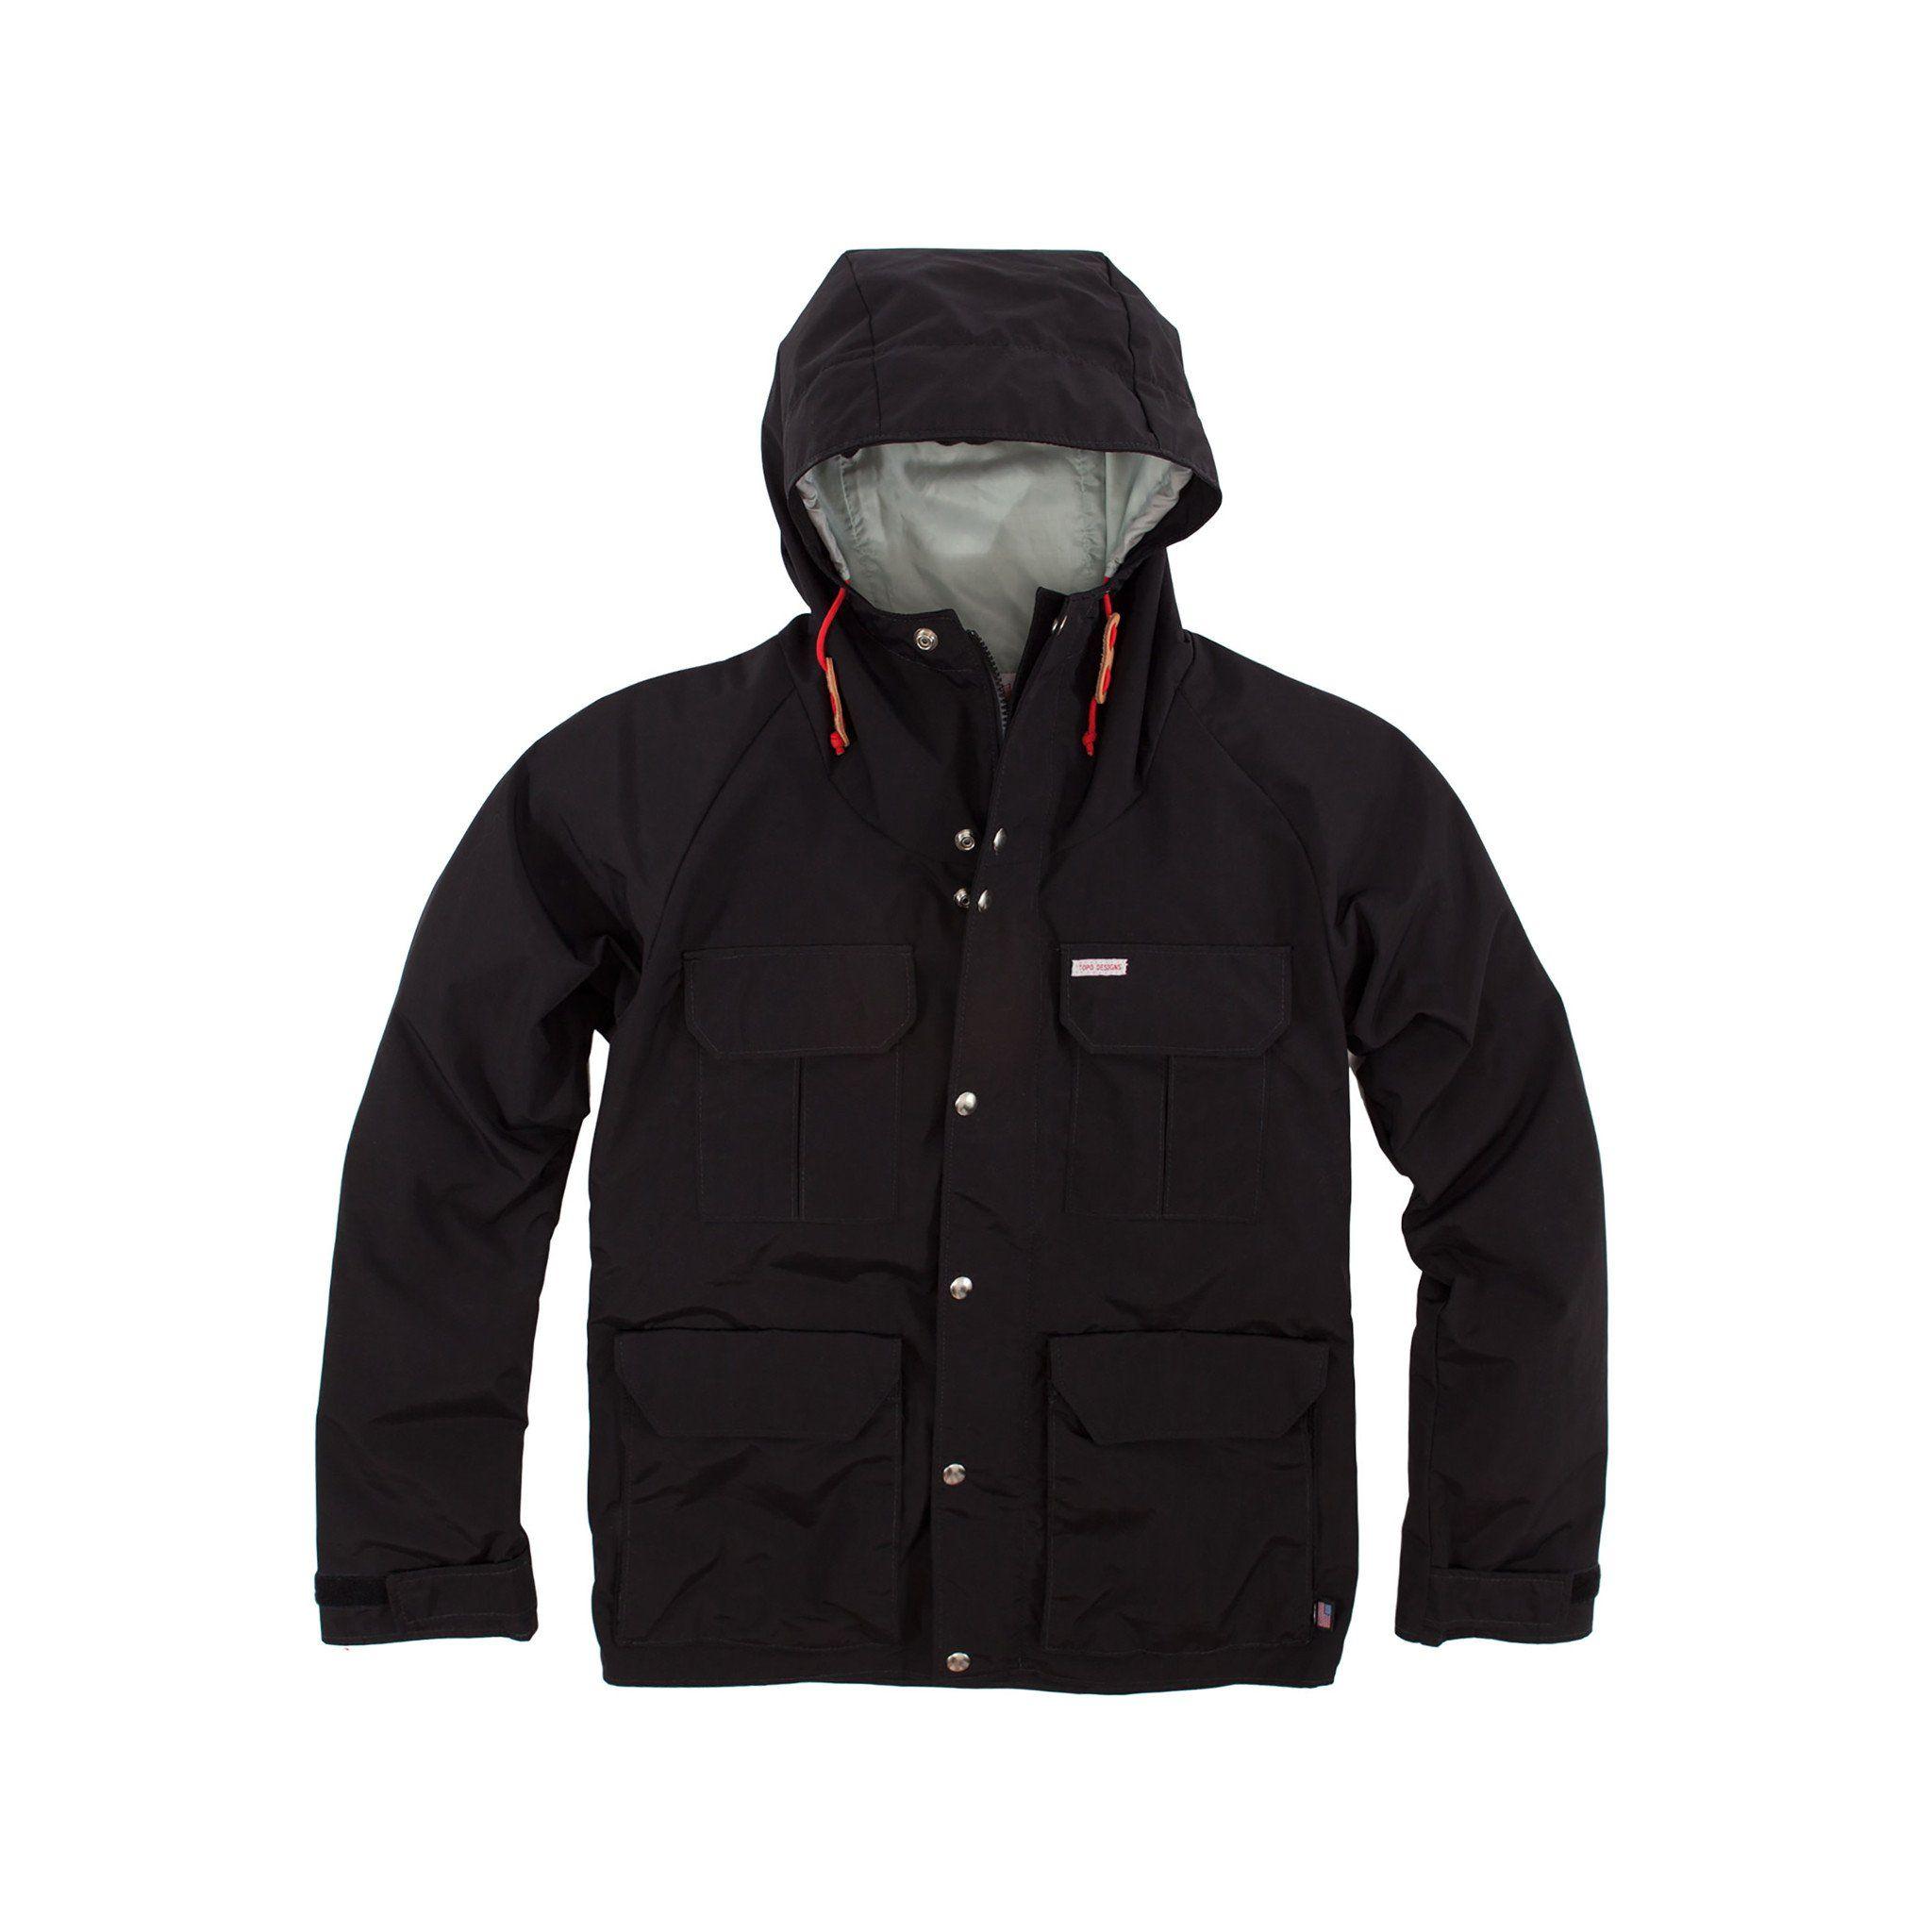 Mountain Jacket (With images) Mountain jacket, Mens rain